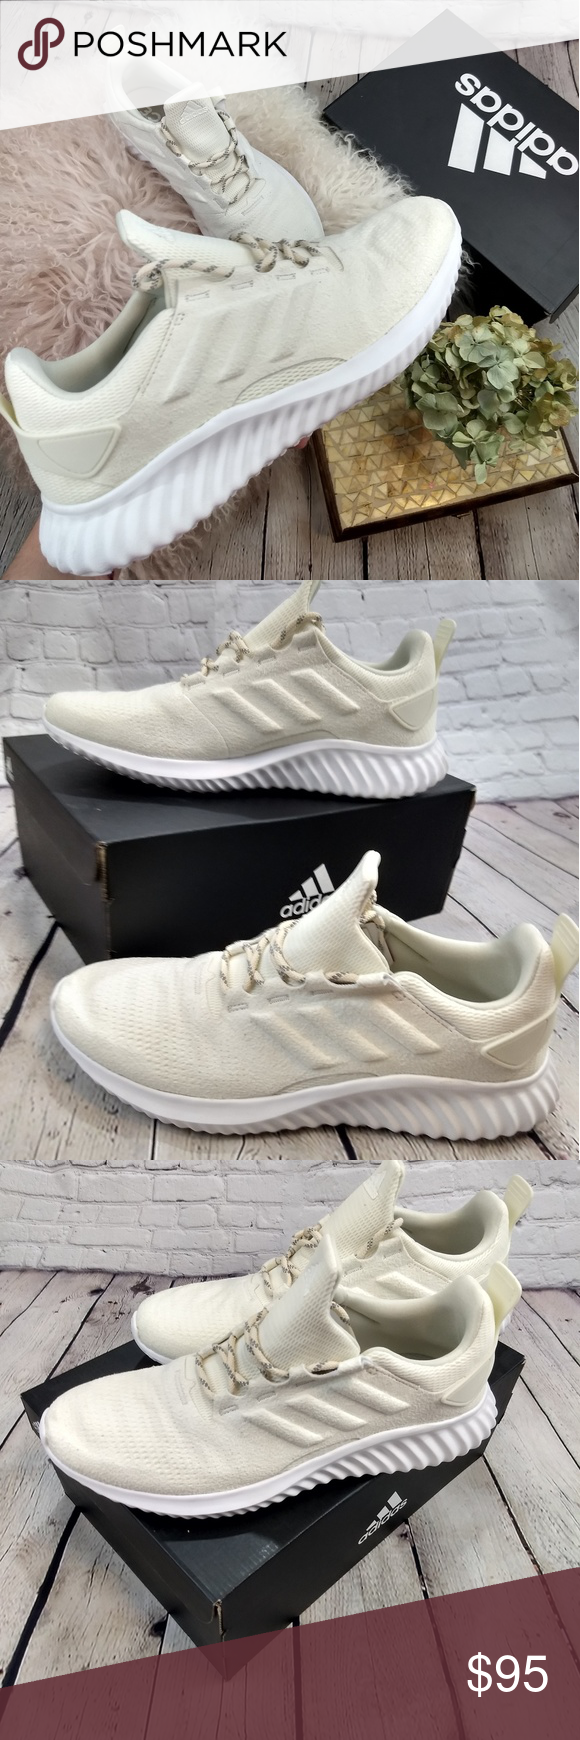 4f1104cc0 Adidas NIB Alphabounce CR m Sneakers Ash Pearl Bran new in box Adidas  Alphabounce sneakers in Ash Pearl. ~Men s size 10 (Women s size 11.5) ~New  in box